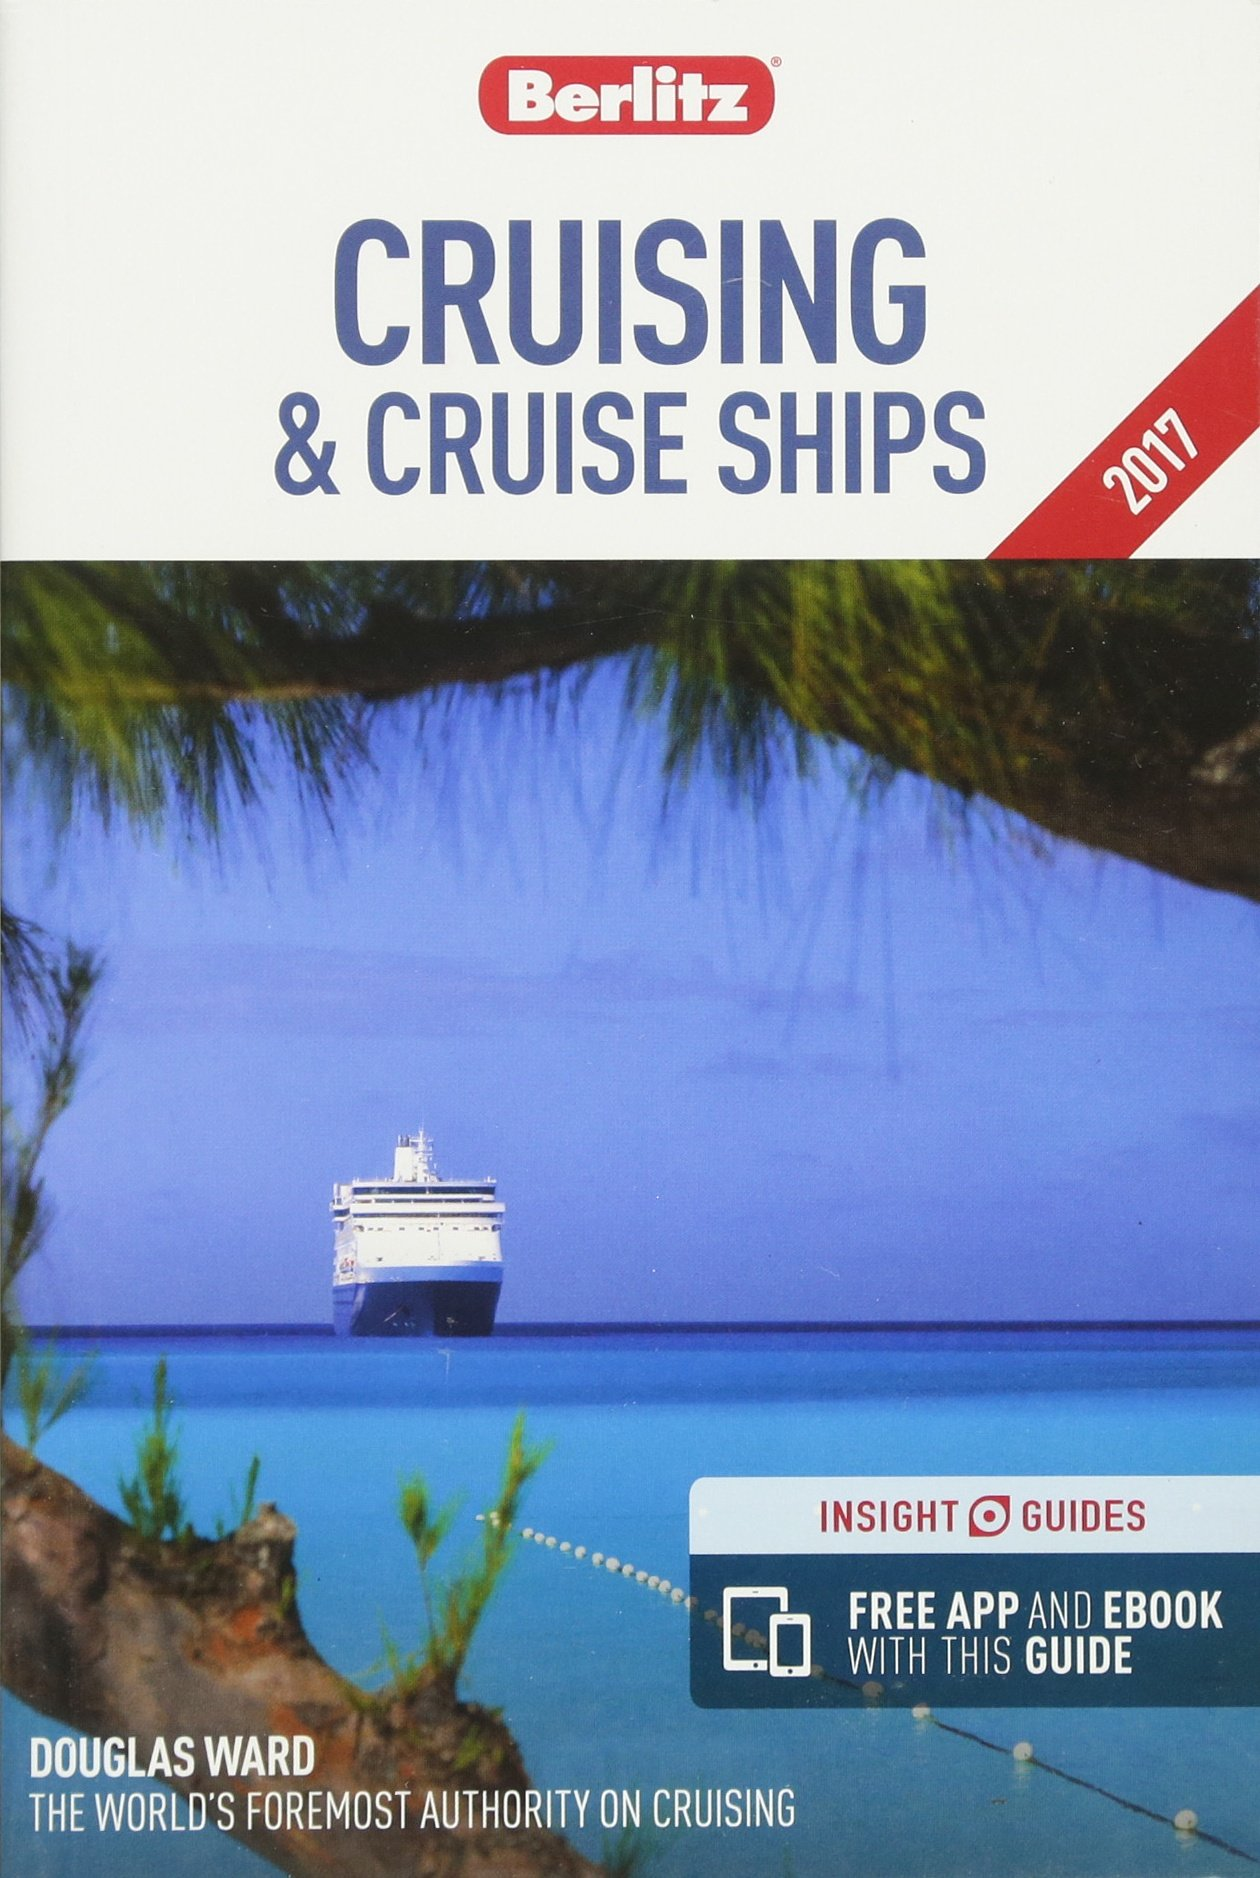 Berlitz Cruising & Cruise Ships 2017 (Berlitz Cruise Guide) pdf